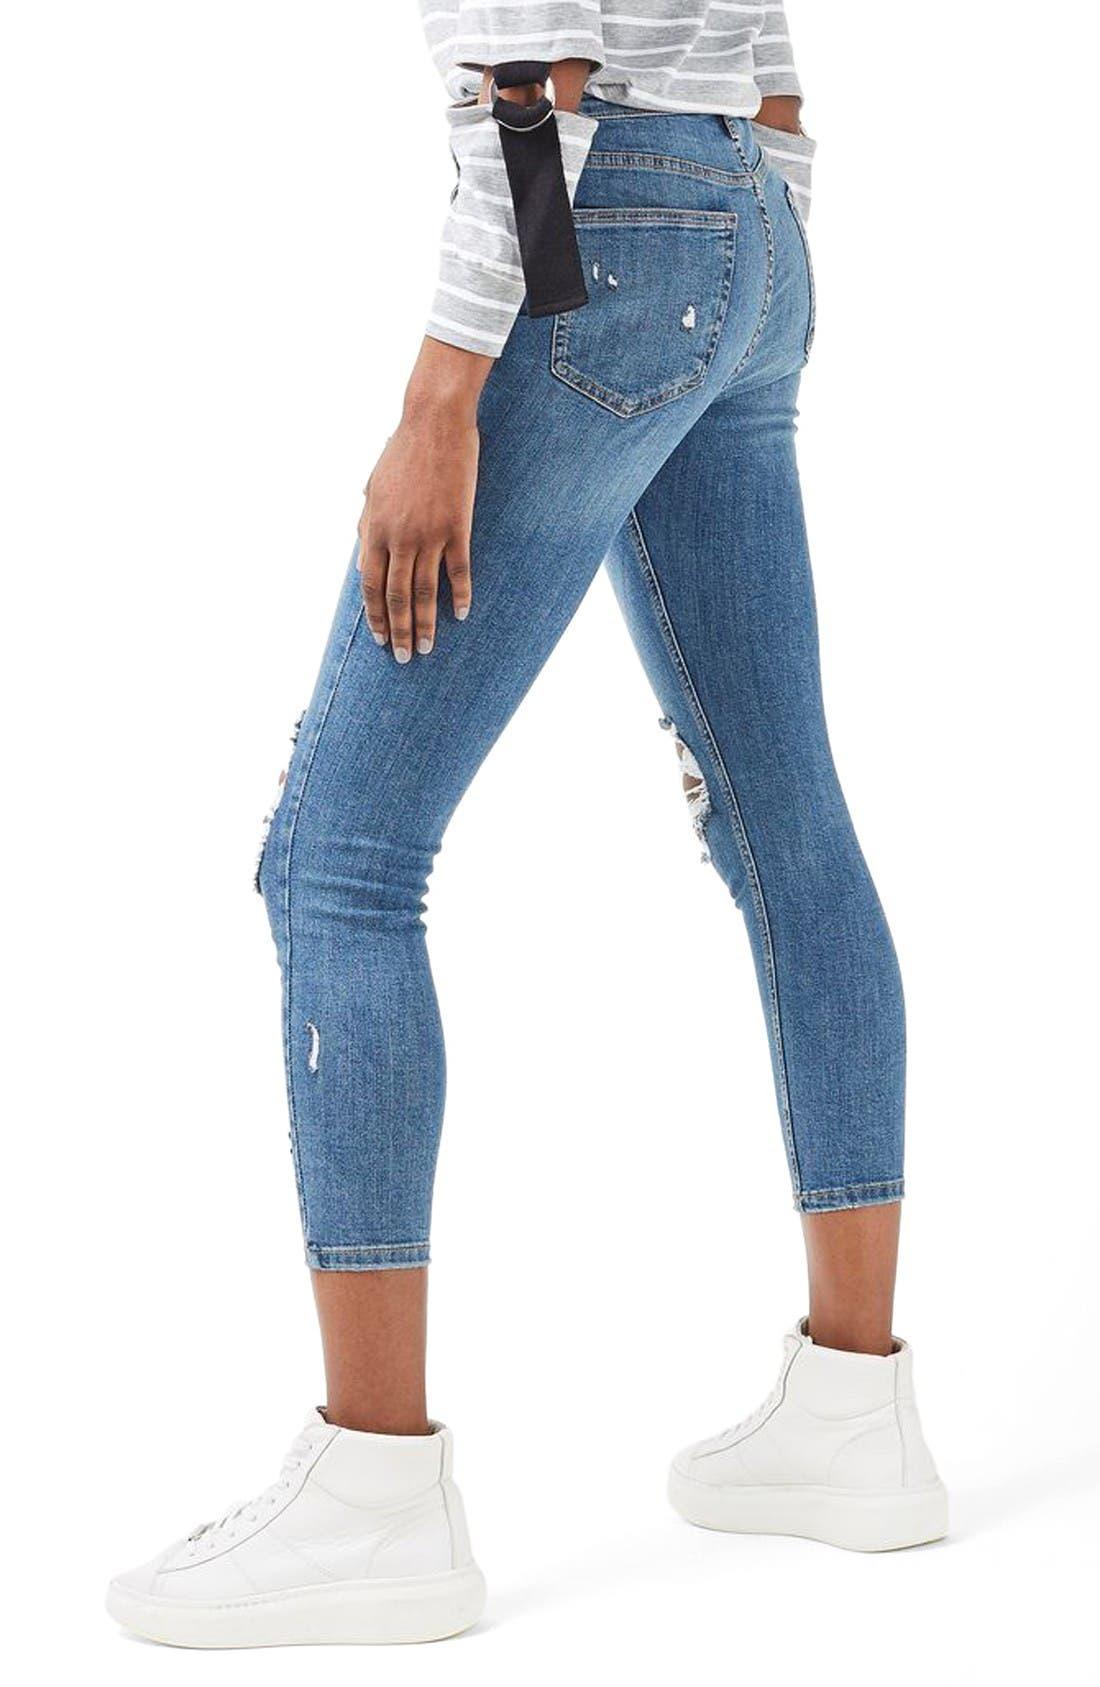 Alternate Image 3  - Topshop Moto Jamie Super Rip Skinny Jeans (Petite)